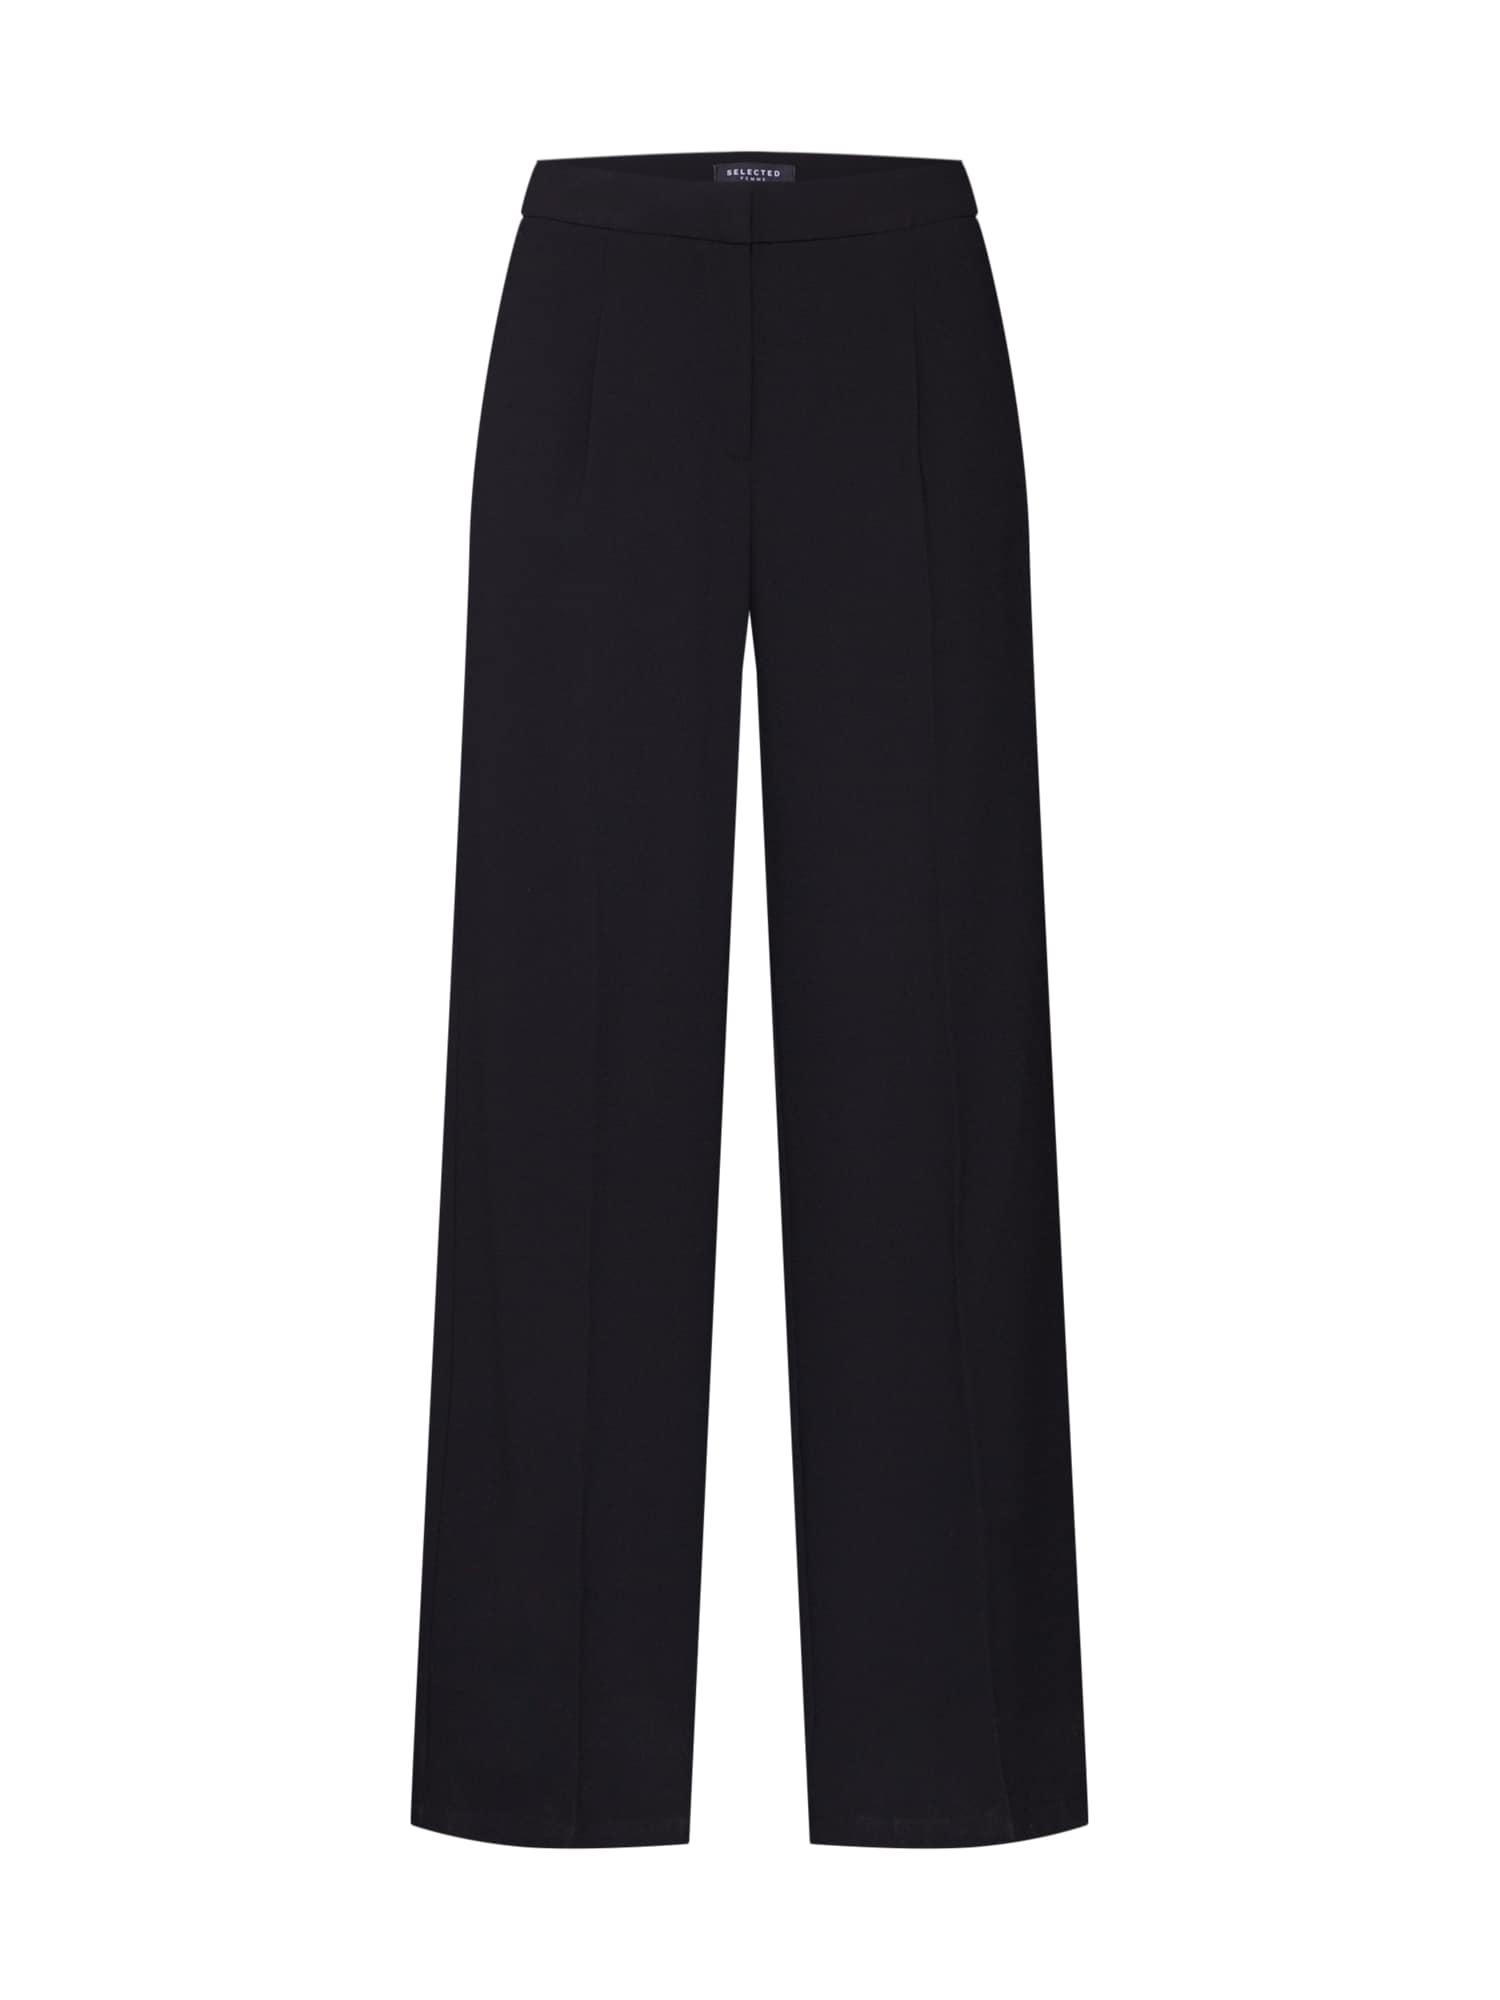 Kalhoty TINNI černá SELECTED FEMME